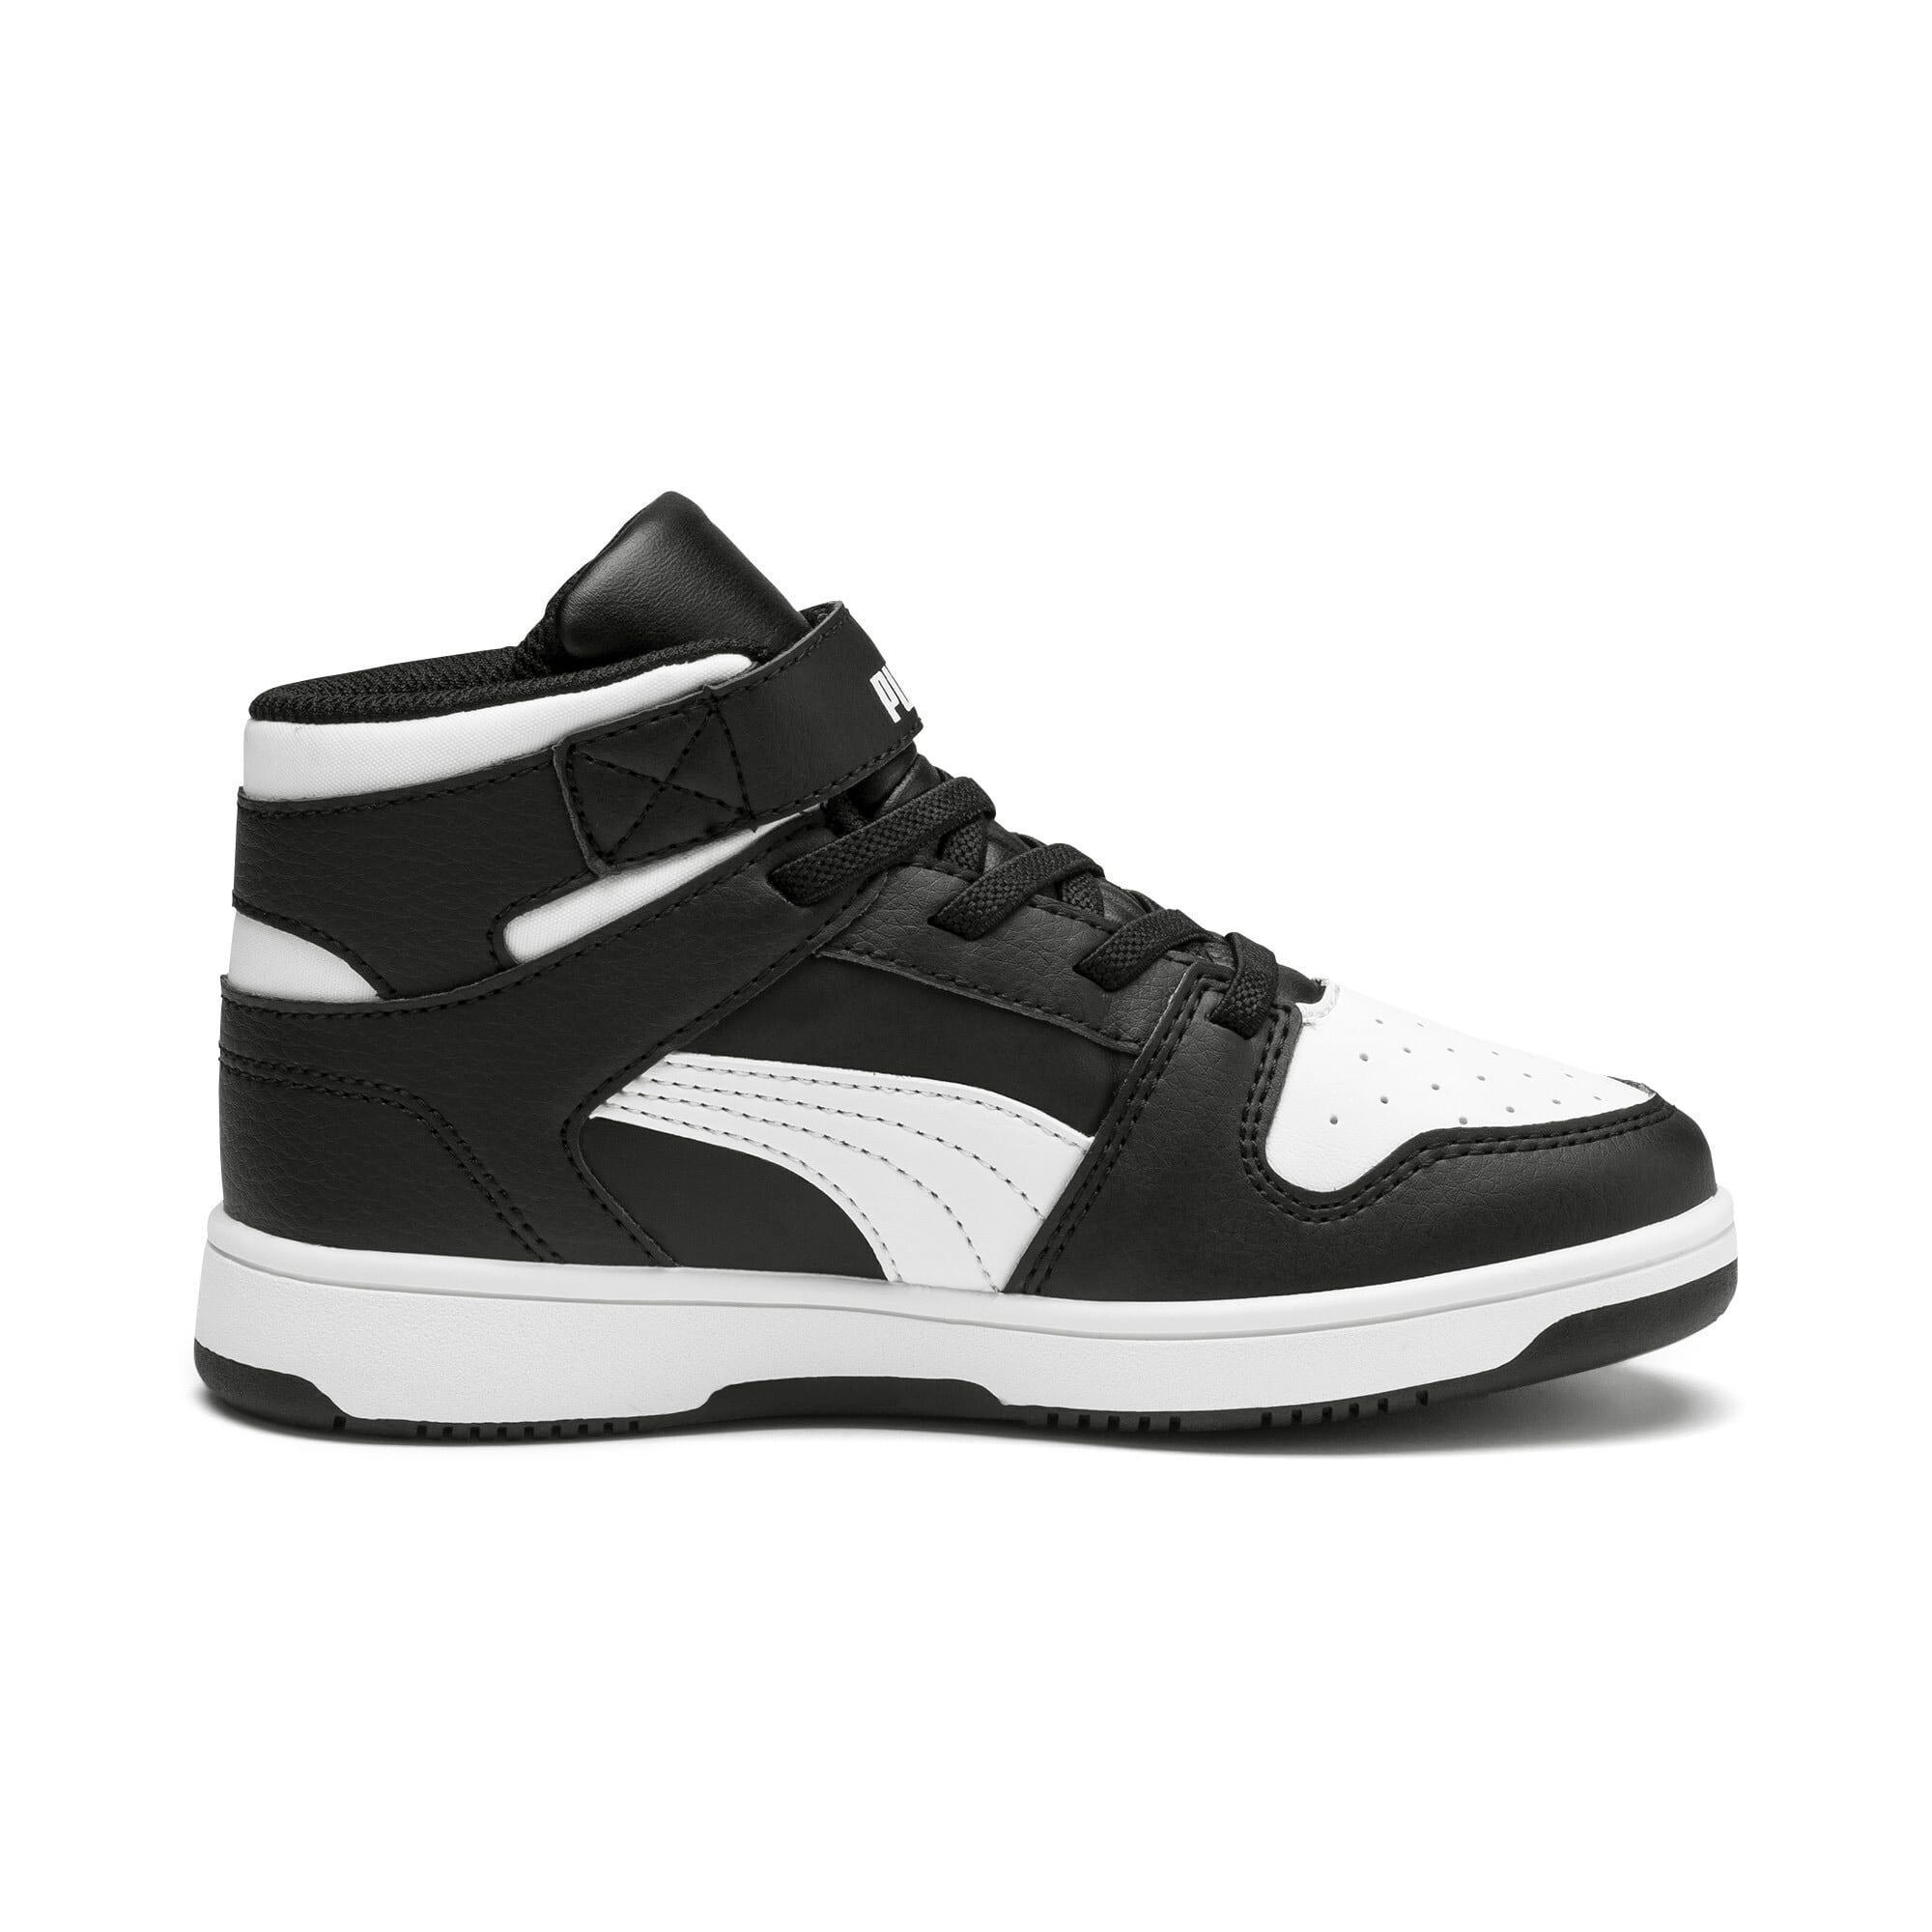 Thumbnail 5 of PUMA Rebound LayUp Little Kids' Shoes, Puma Black-Puma White, medium